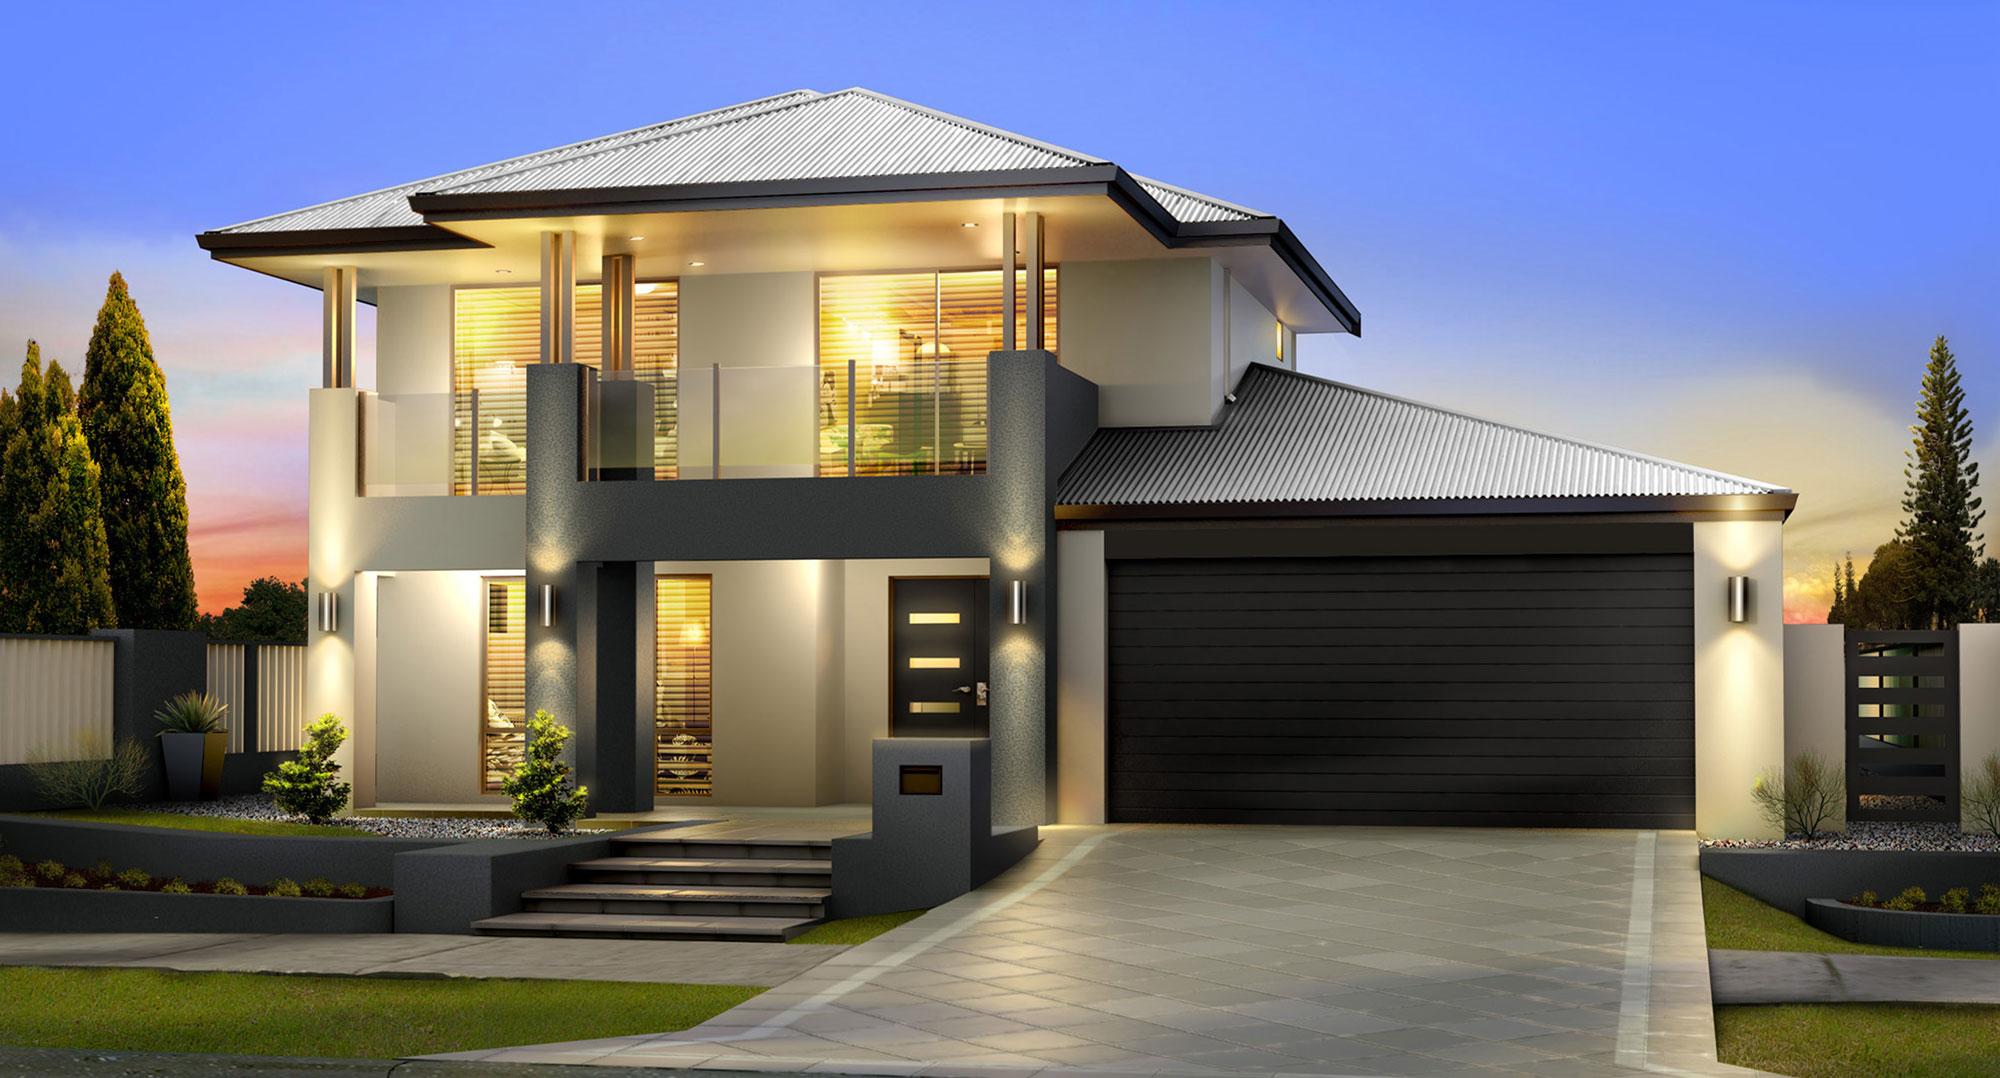 The san marco classic 2 storey homes mandurah perth wa for House classics 2000